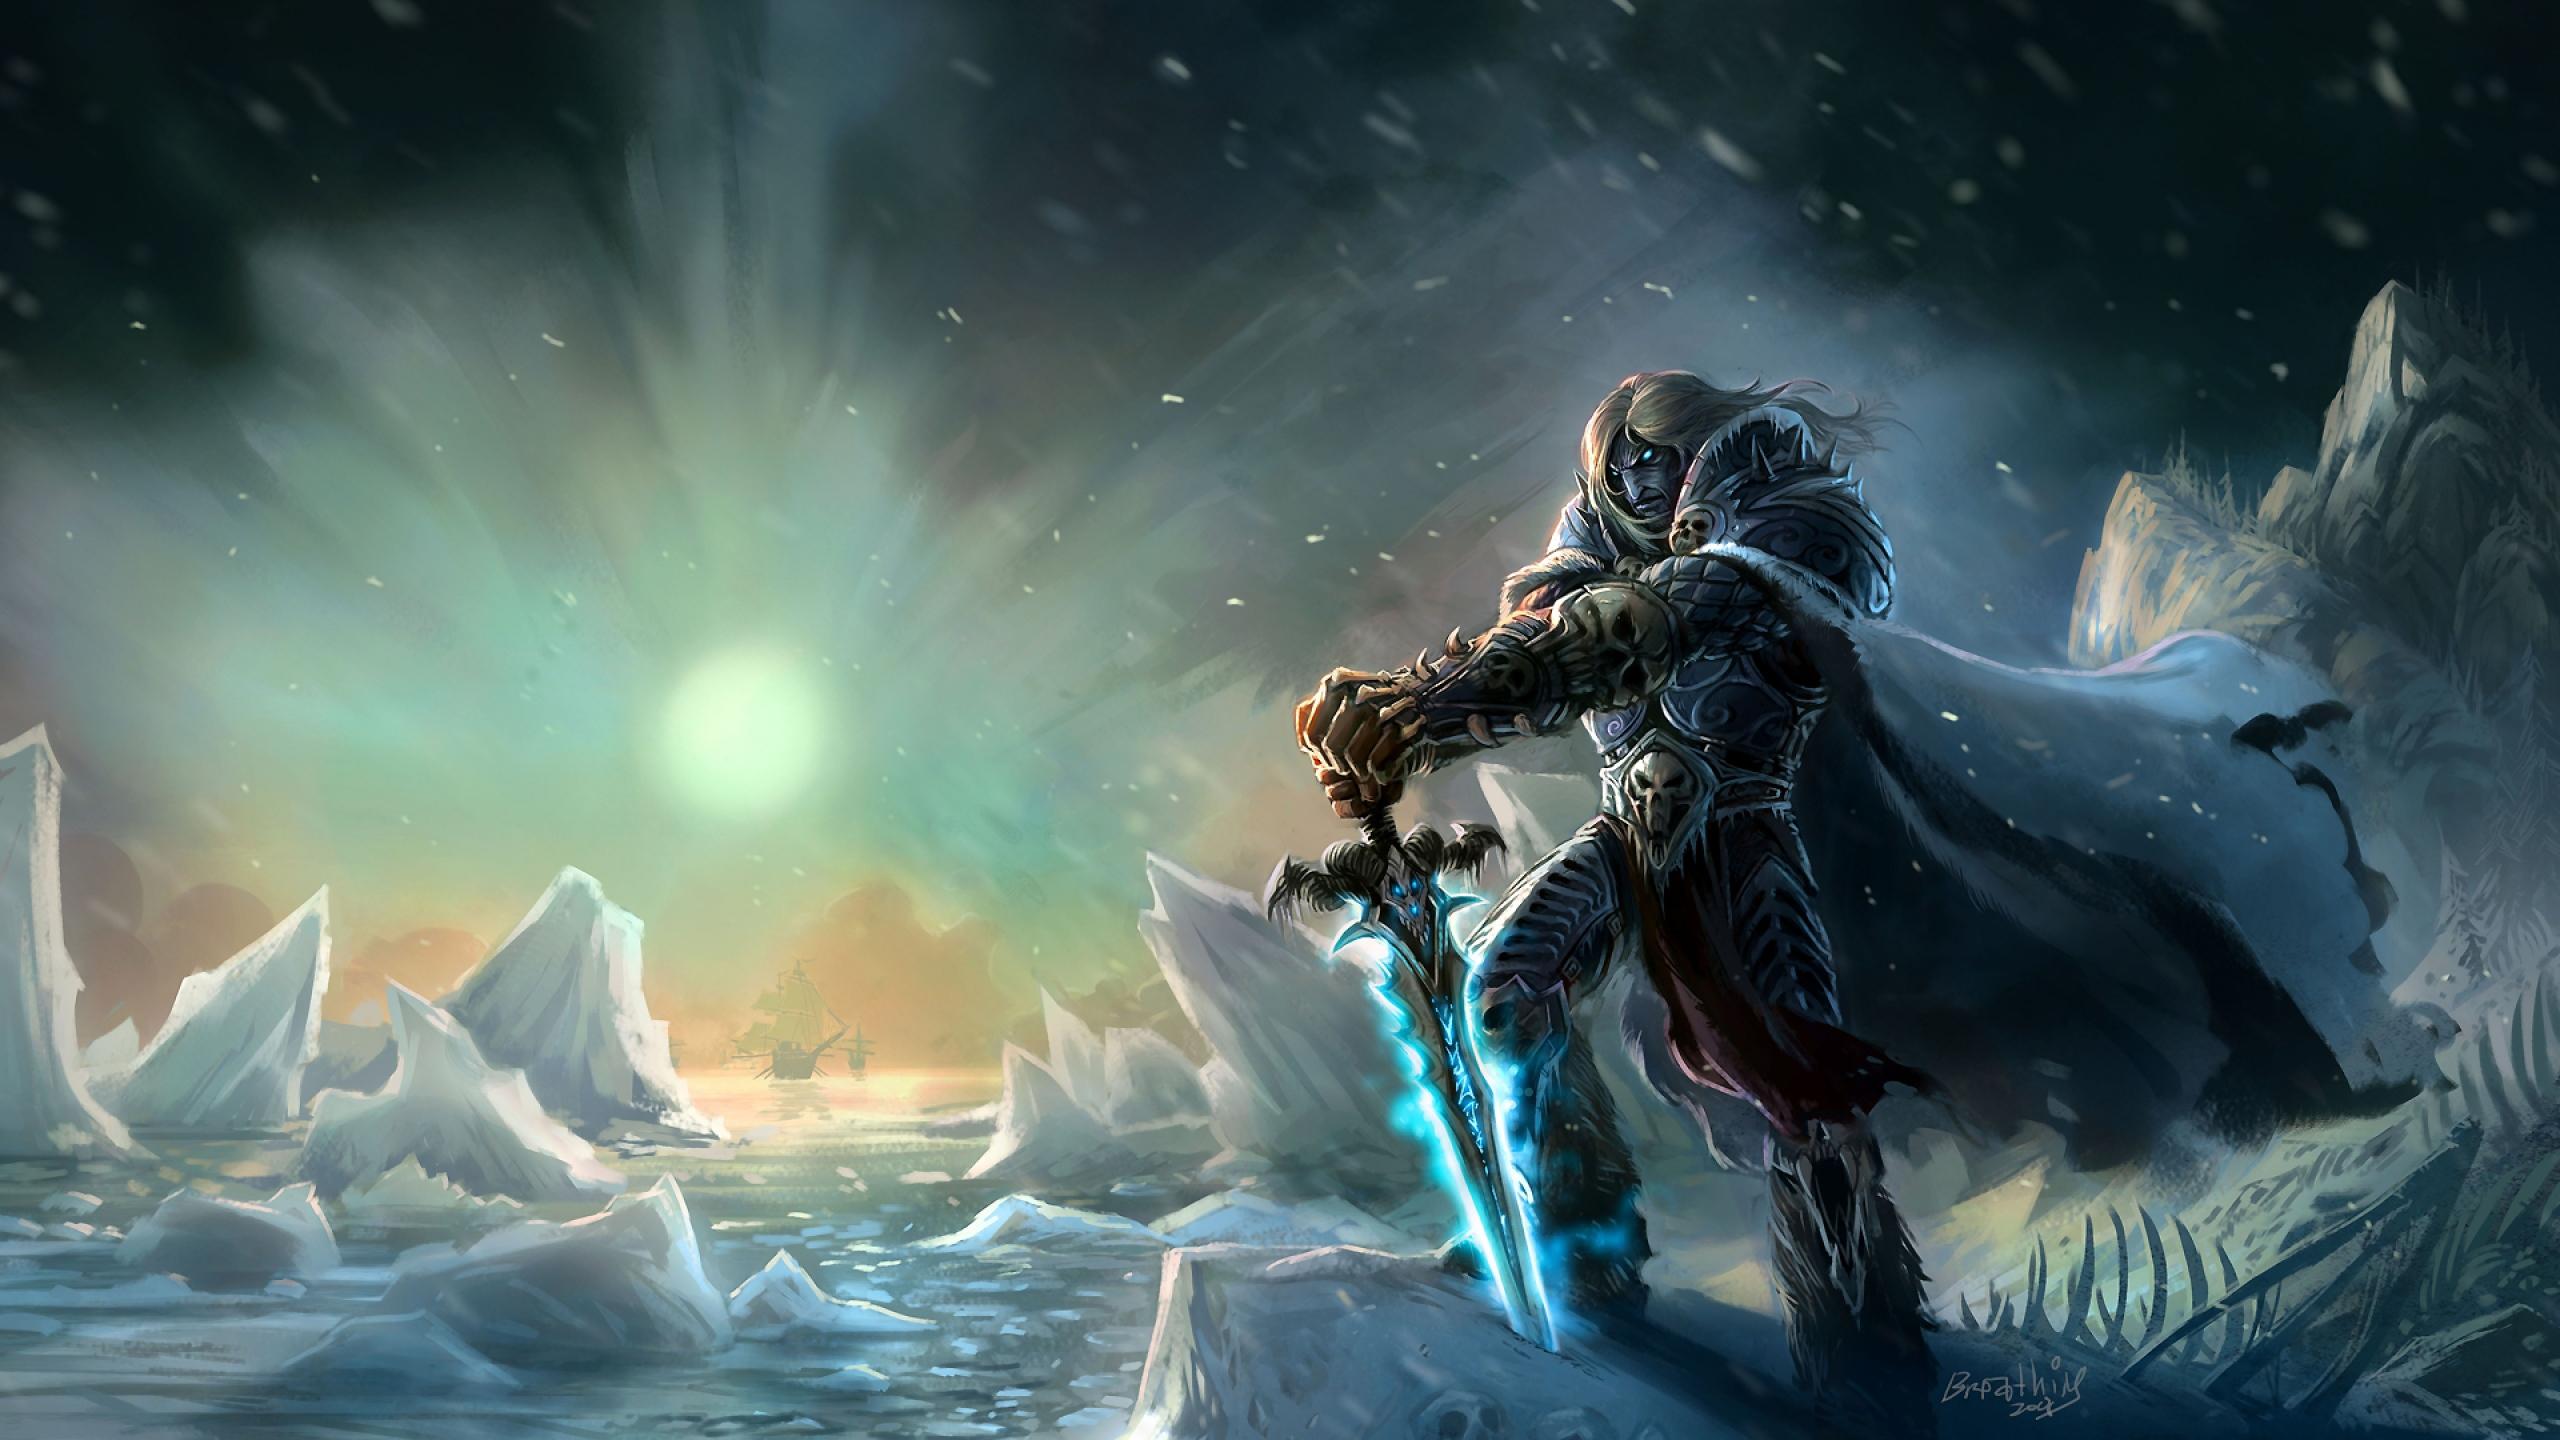 games_artwork_warcraft_82280_2560x1440